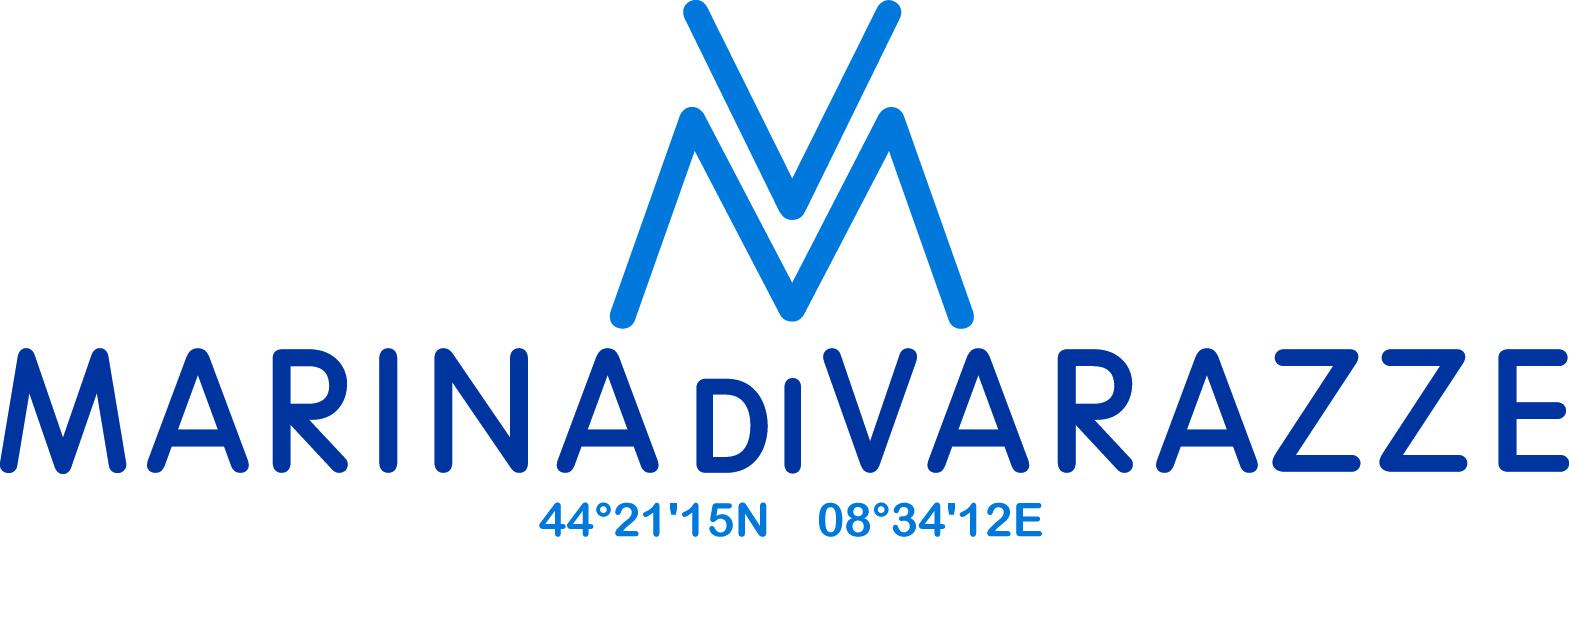 Marina-di-Varazze-logo